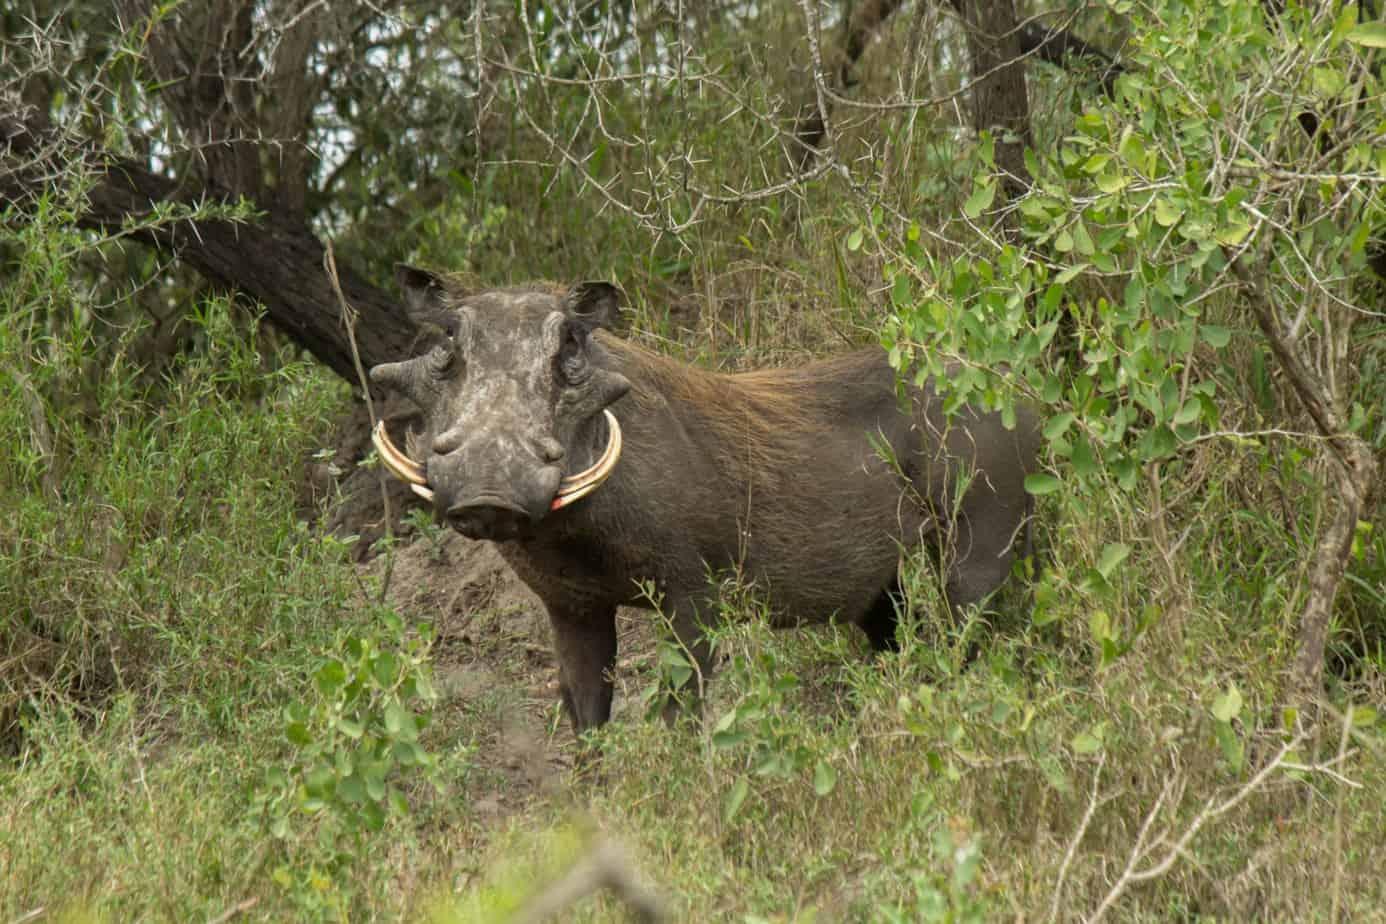 Common Warthog @ Tembe Elephant Park. Photo: Håvard Rosenlund